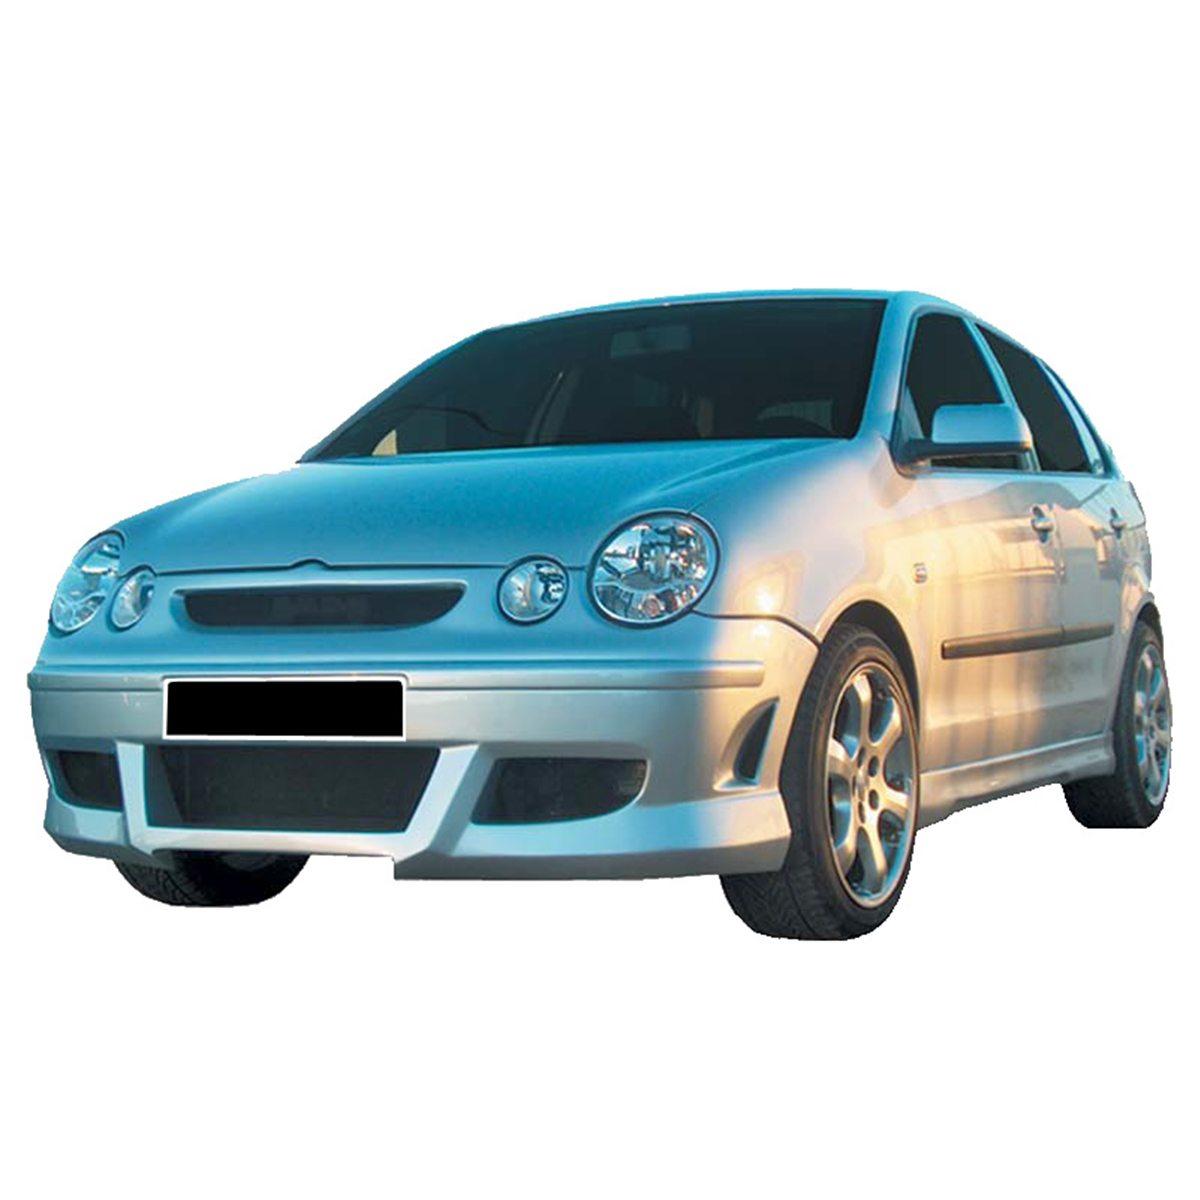 VW-Polo-VI-Cool-Frt-PCA150